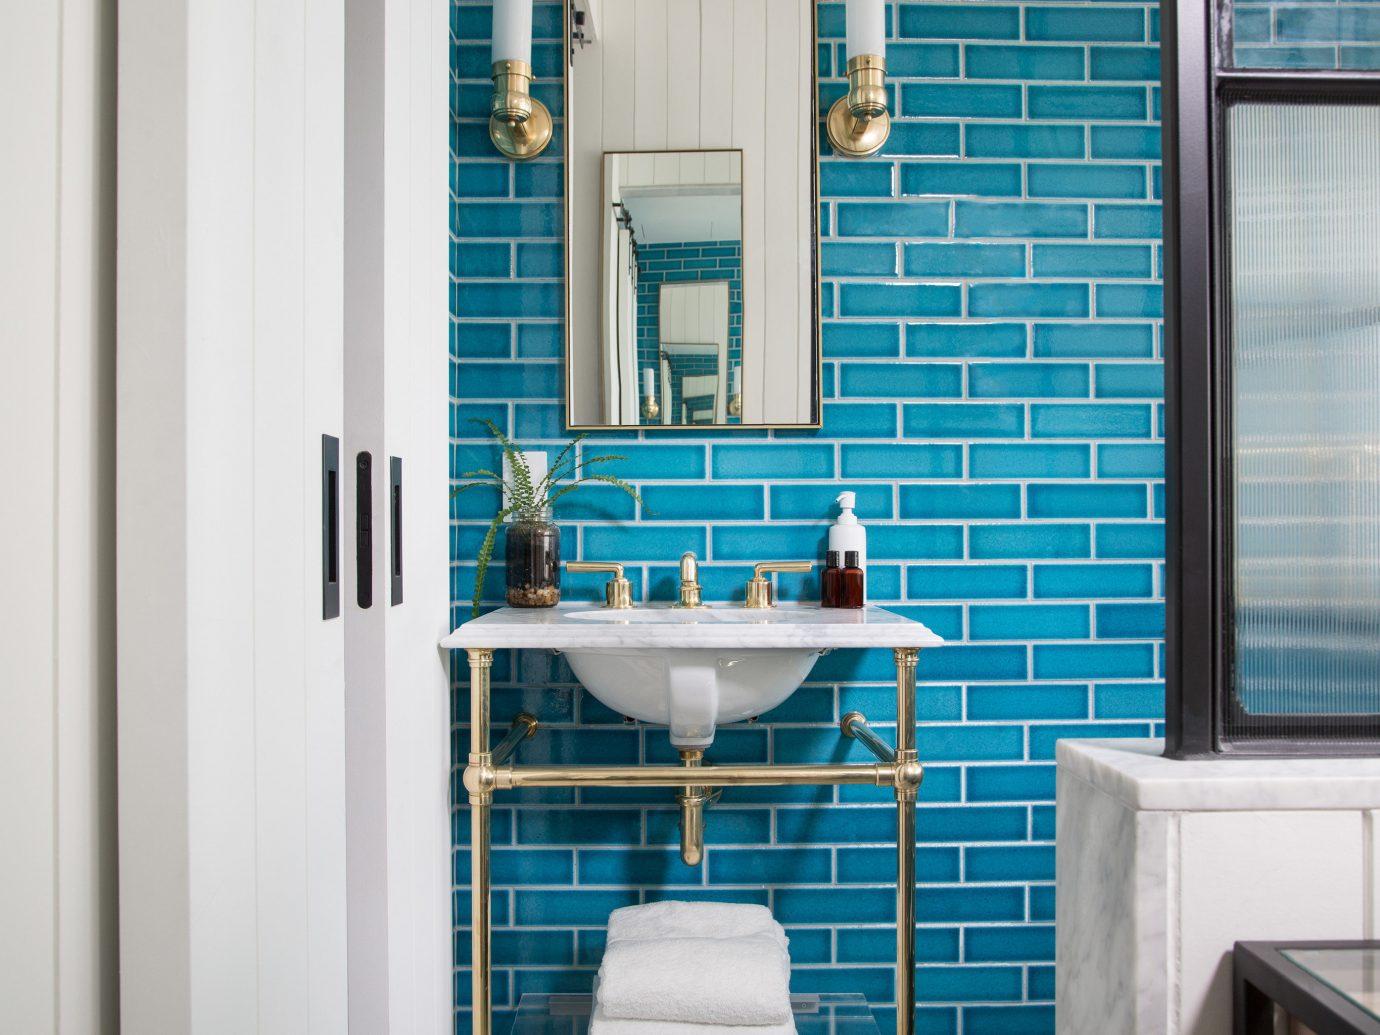 Trip Ideas wall indoor blue room bathroom home interior design window covering window Design apartment tiled